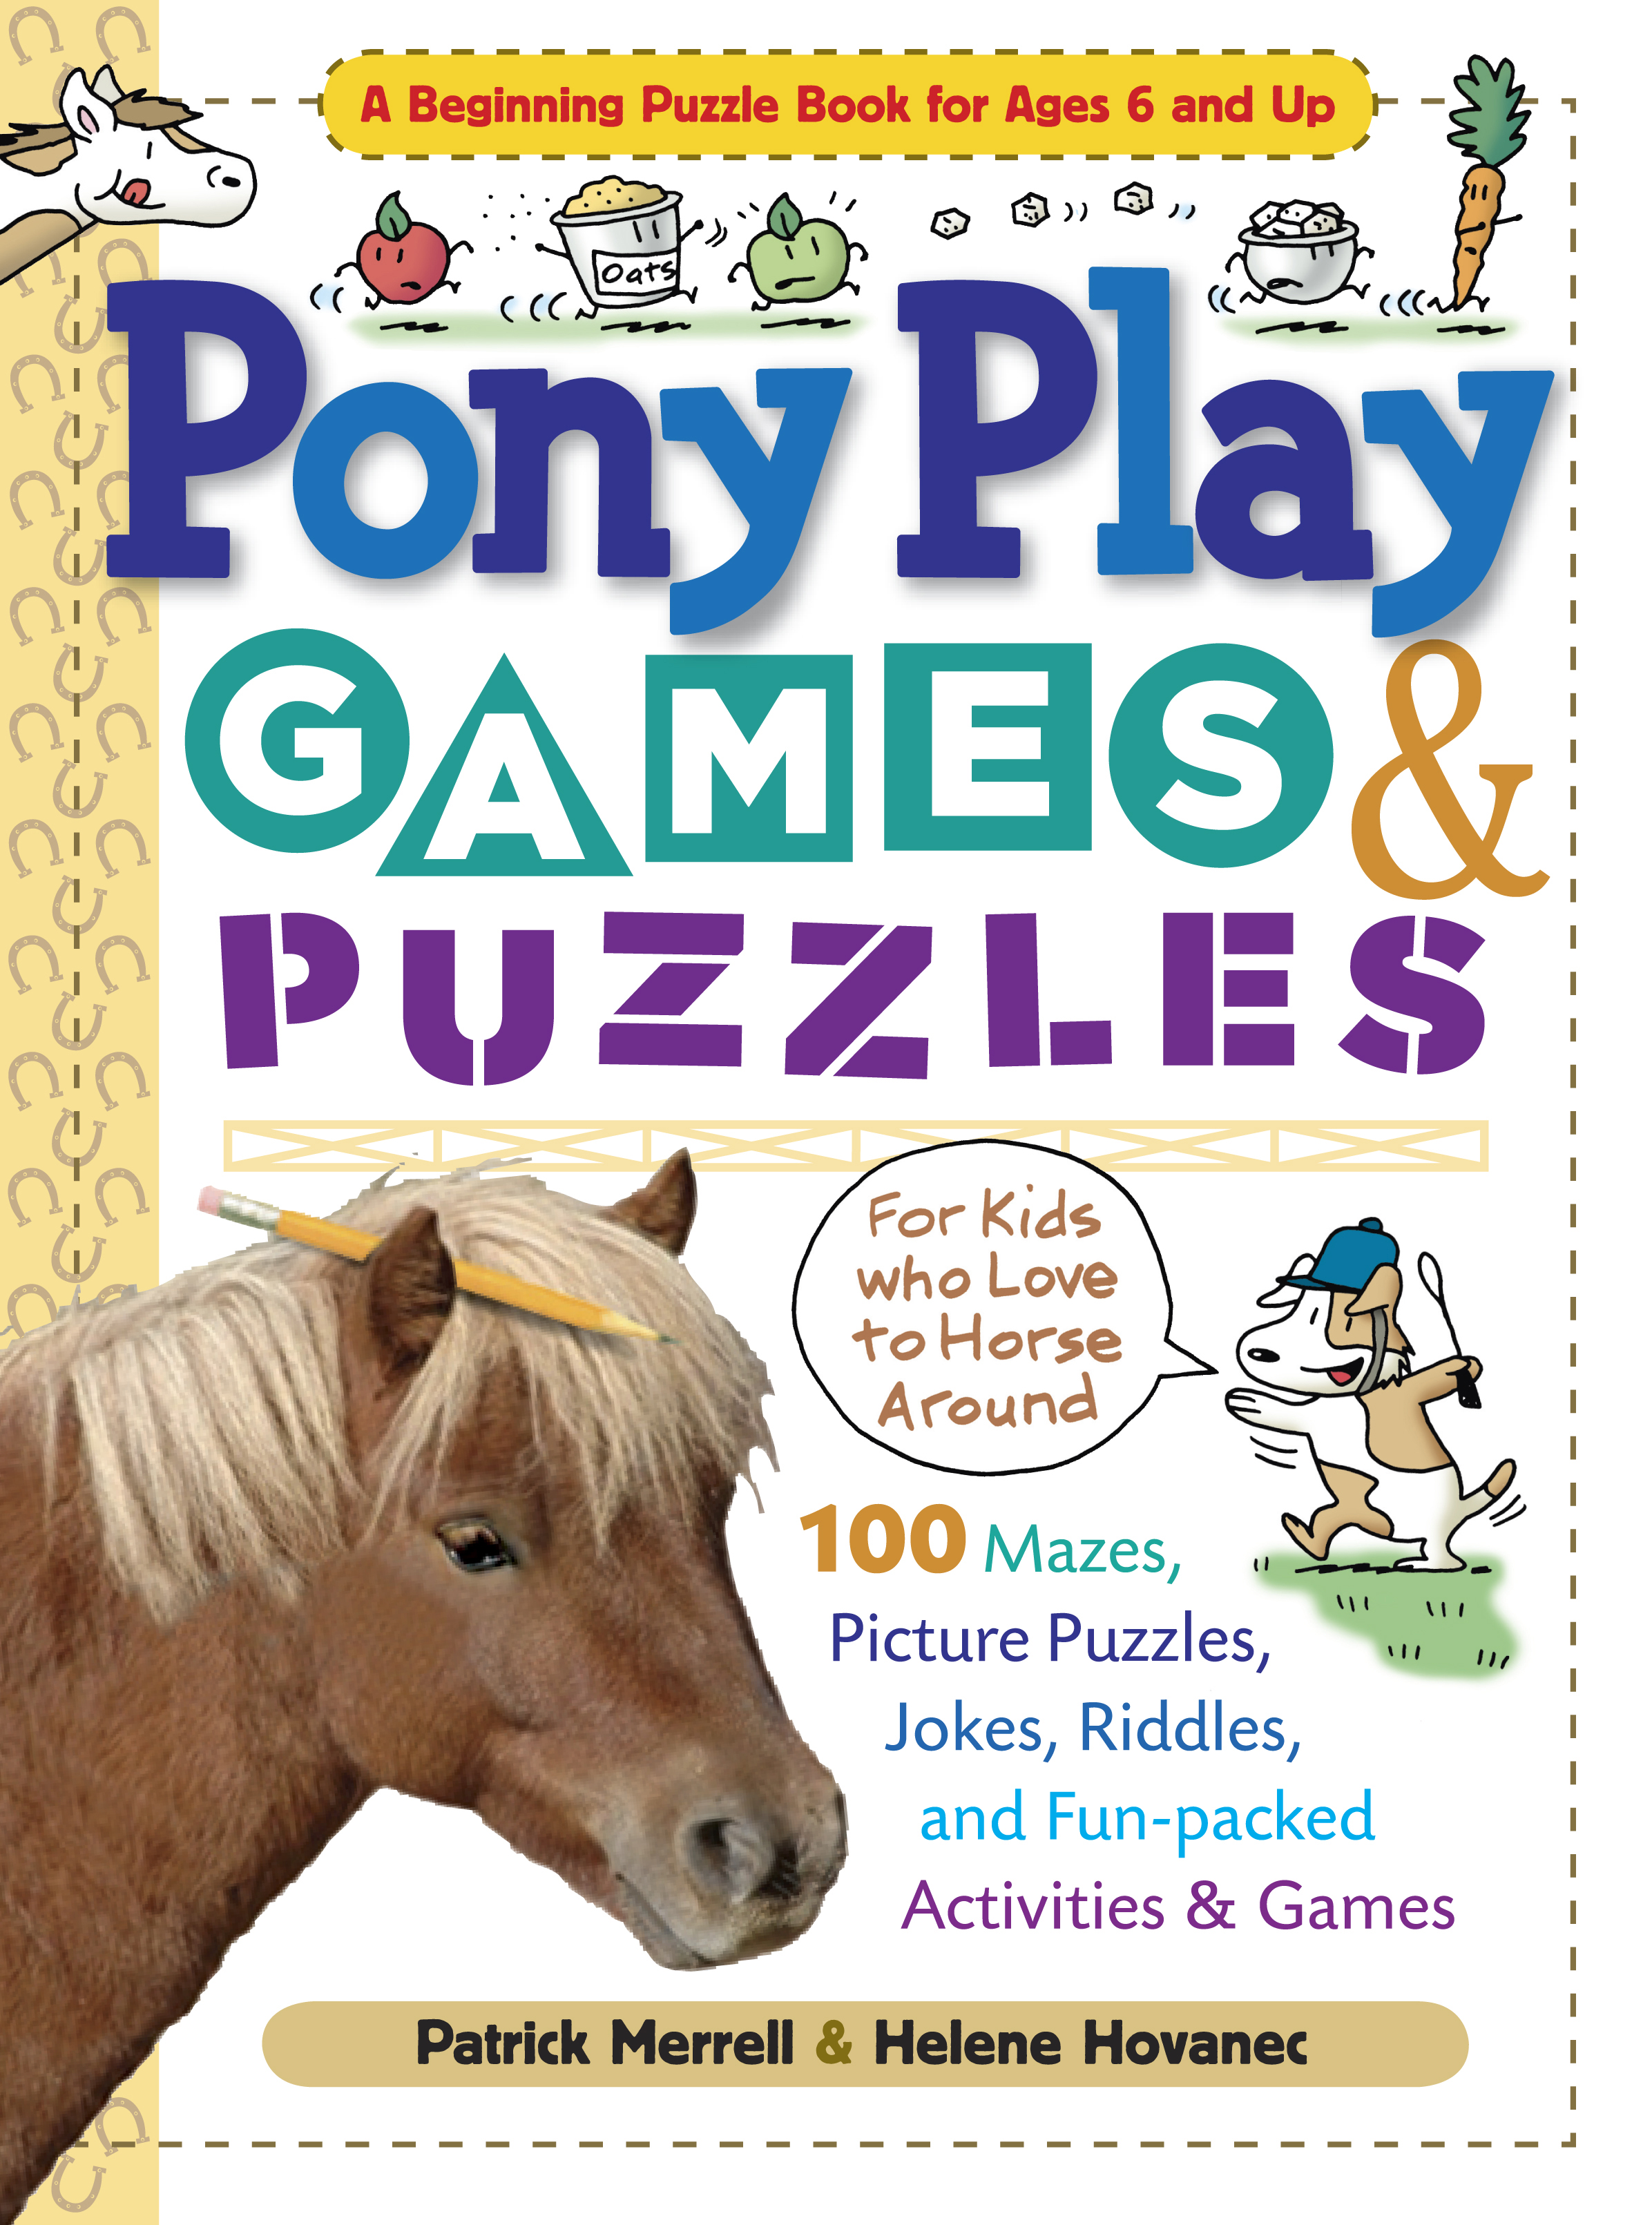 Pony Play Games & Puzzles  - Helene Hovanec